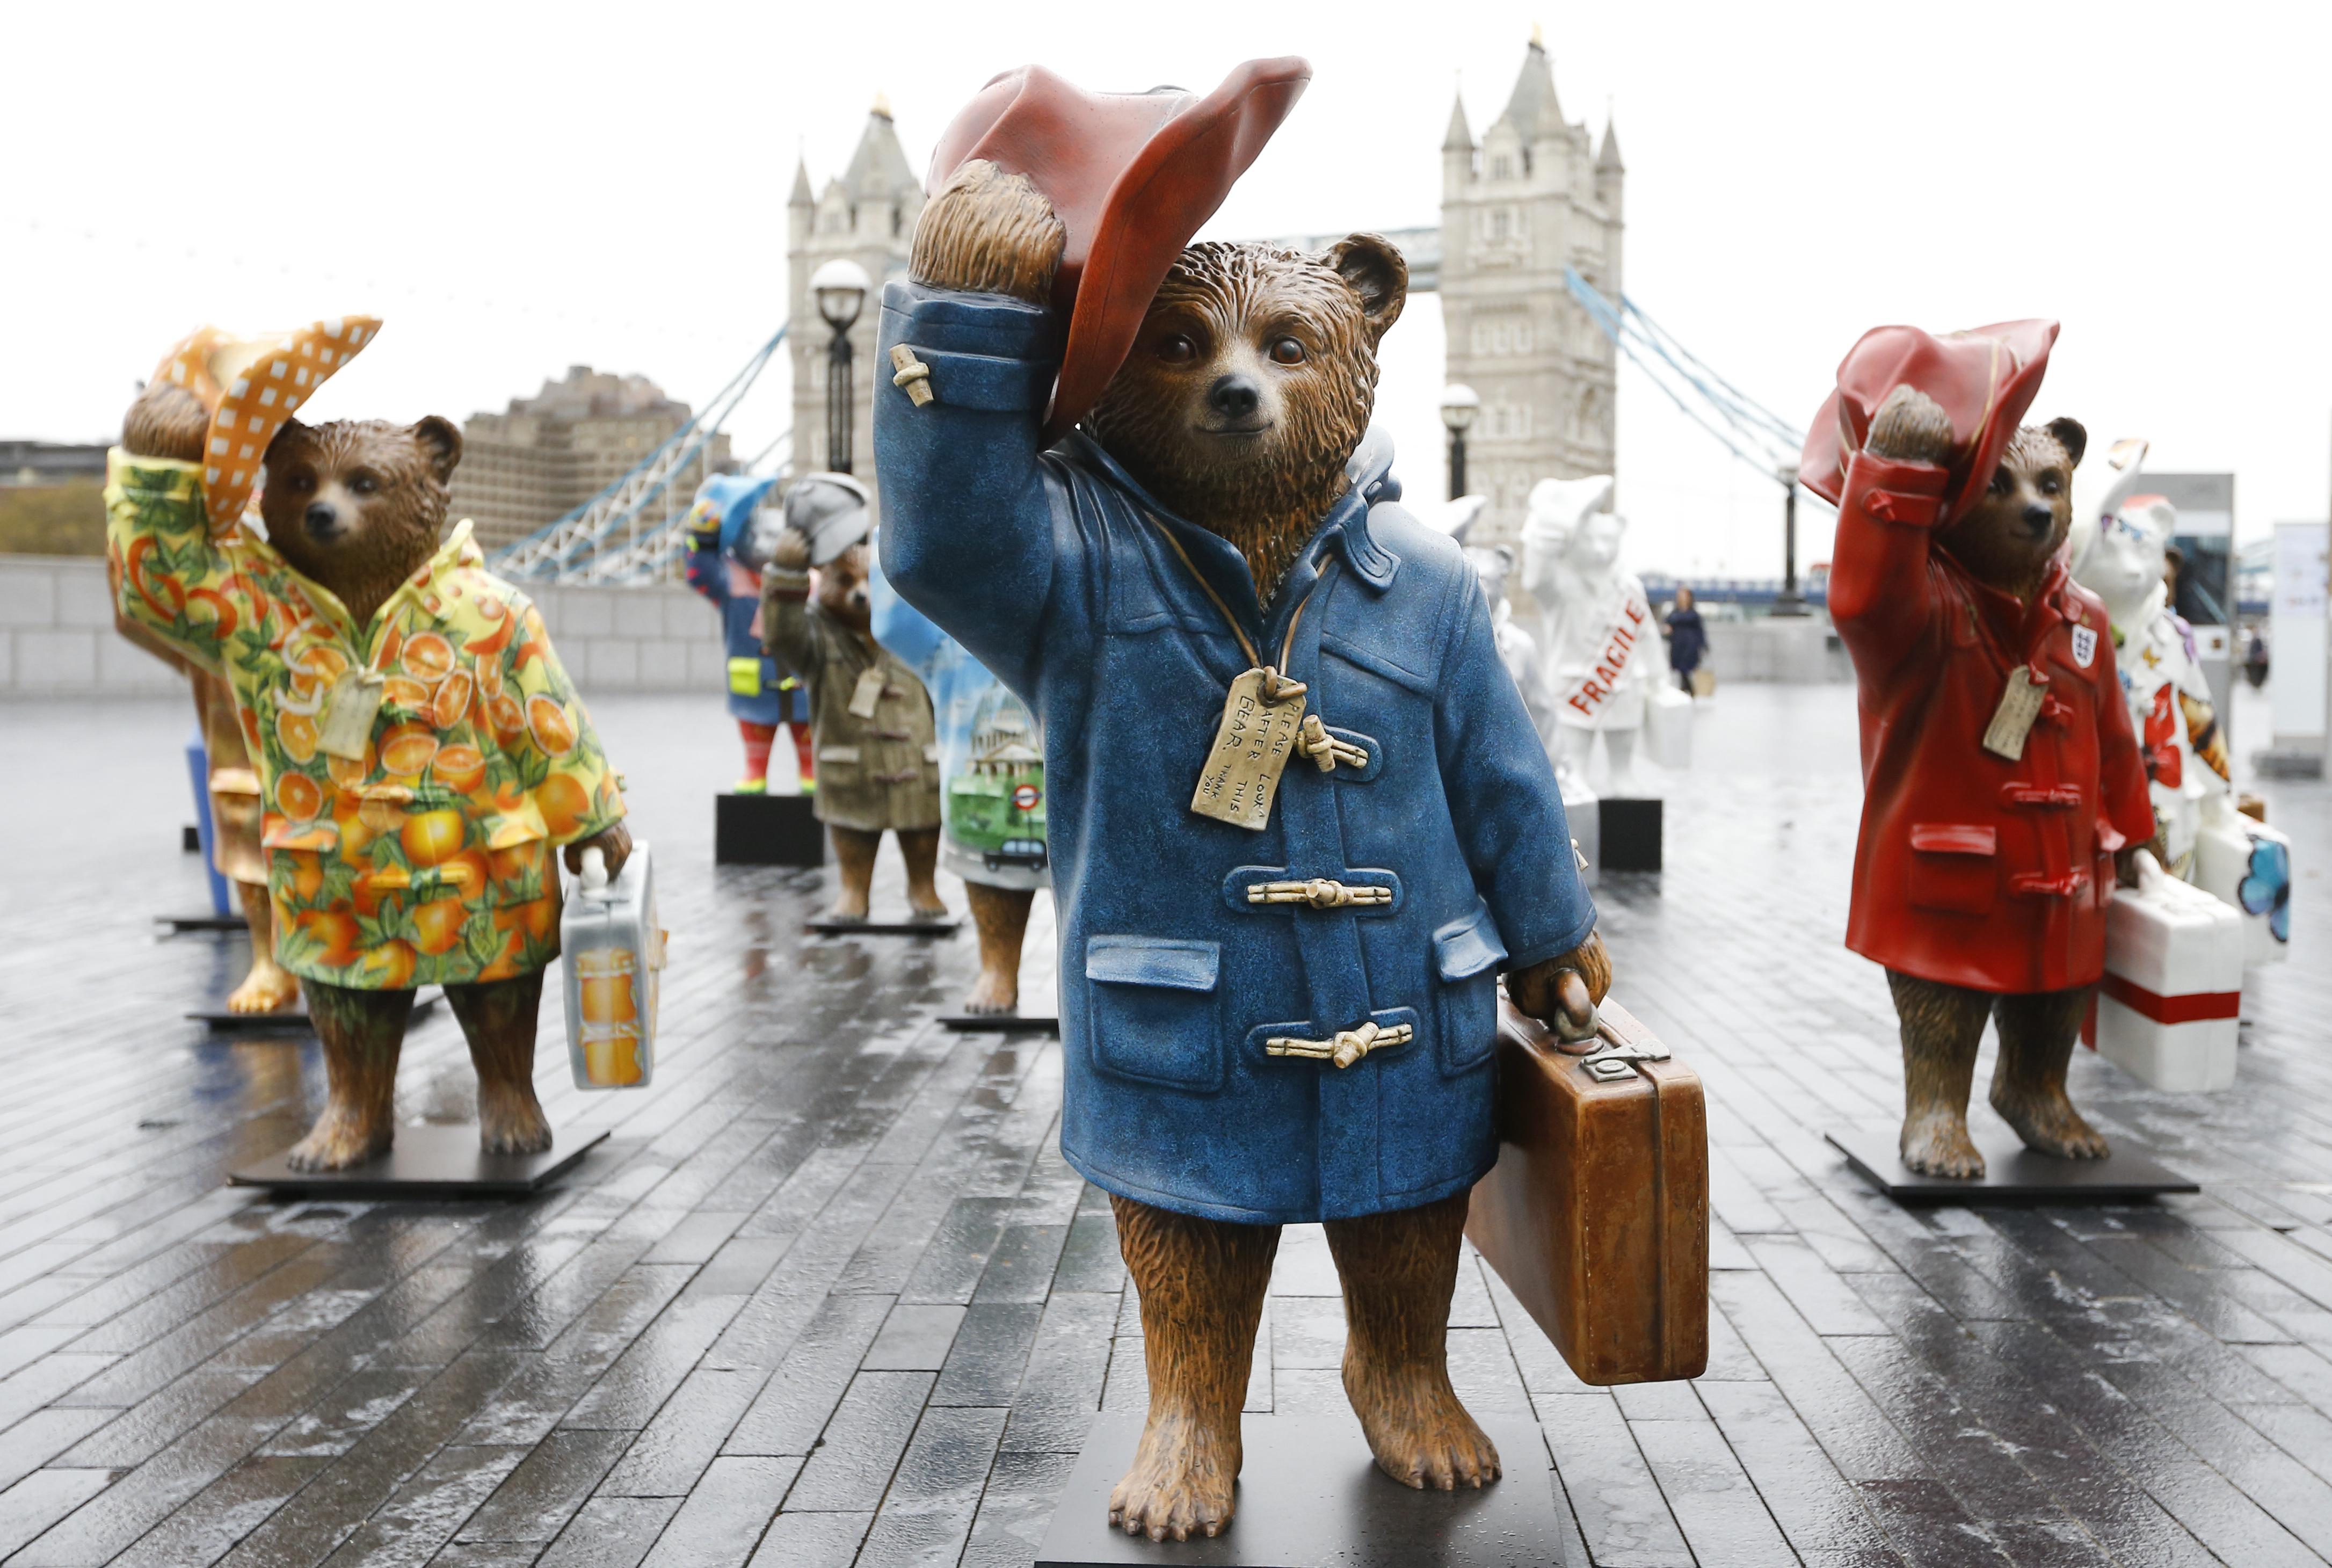 Paddington Bear statues in London